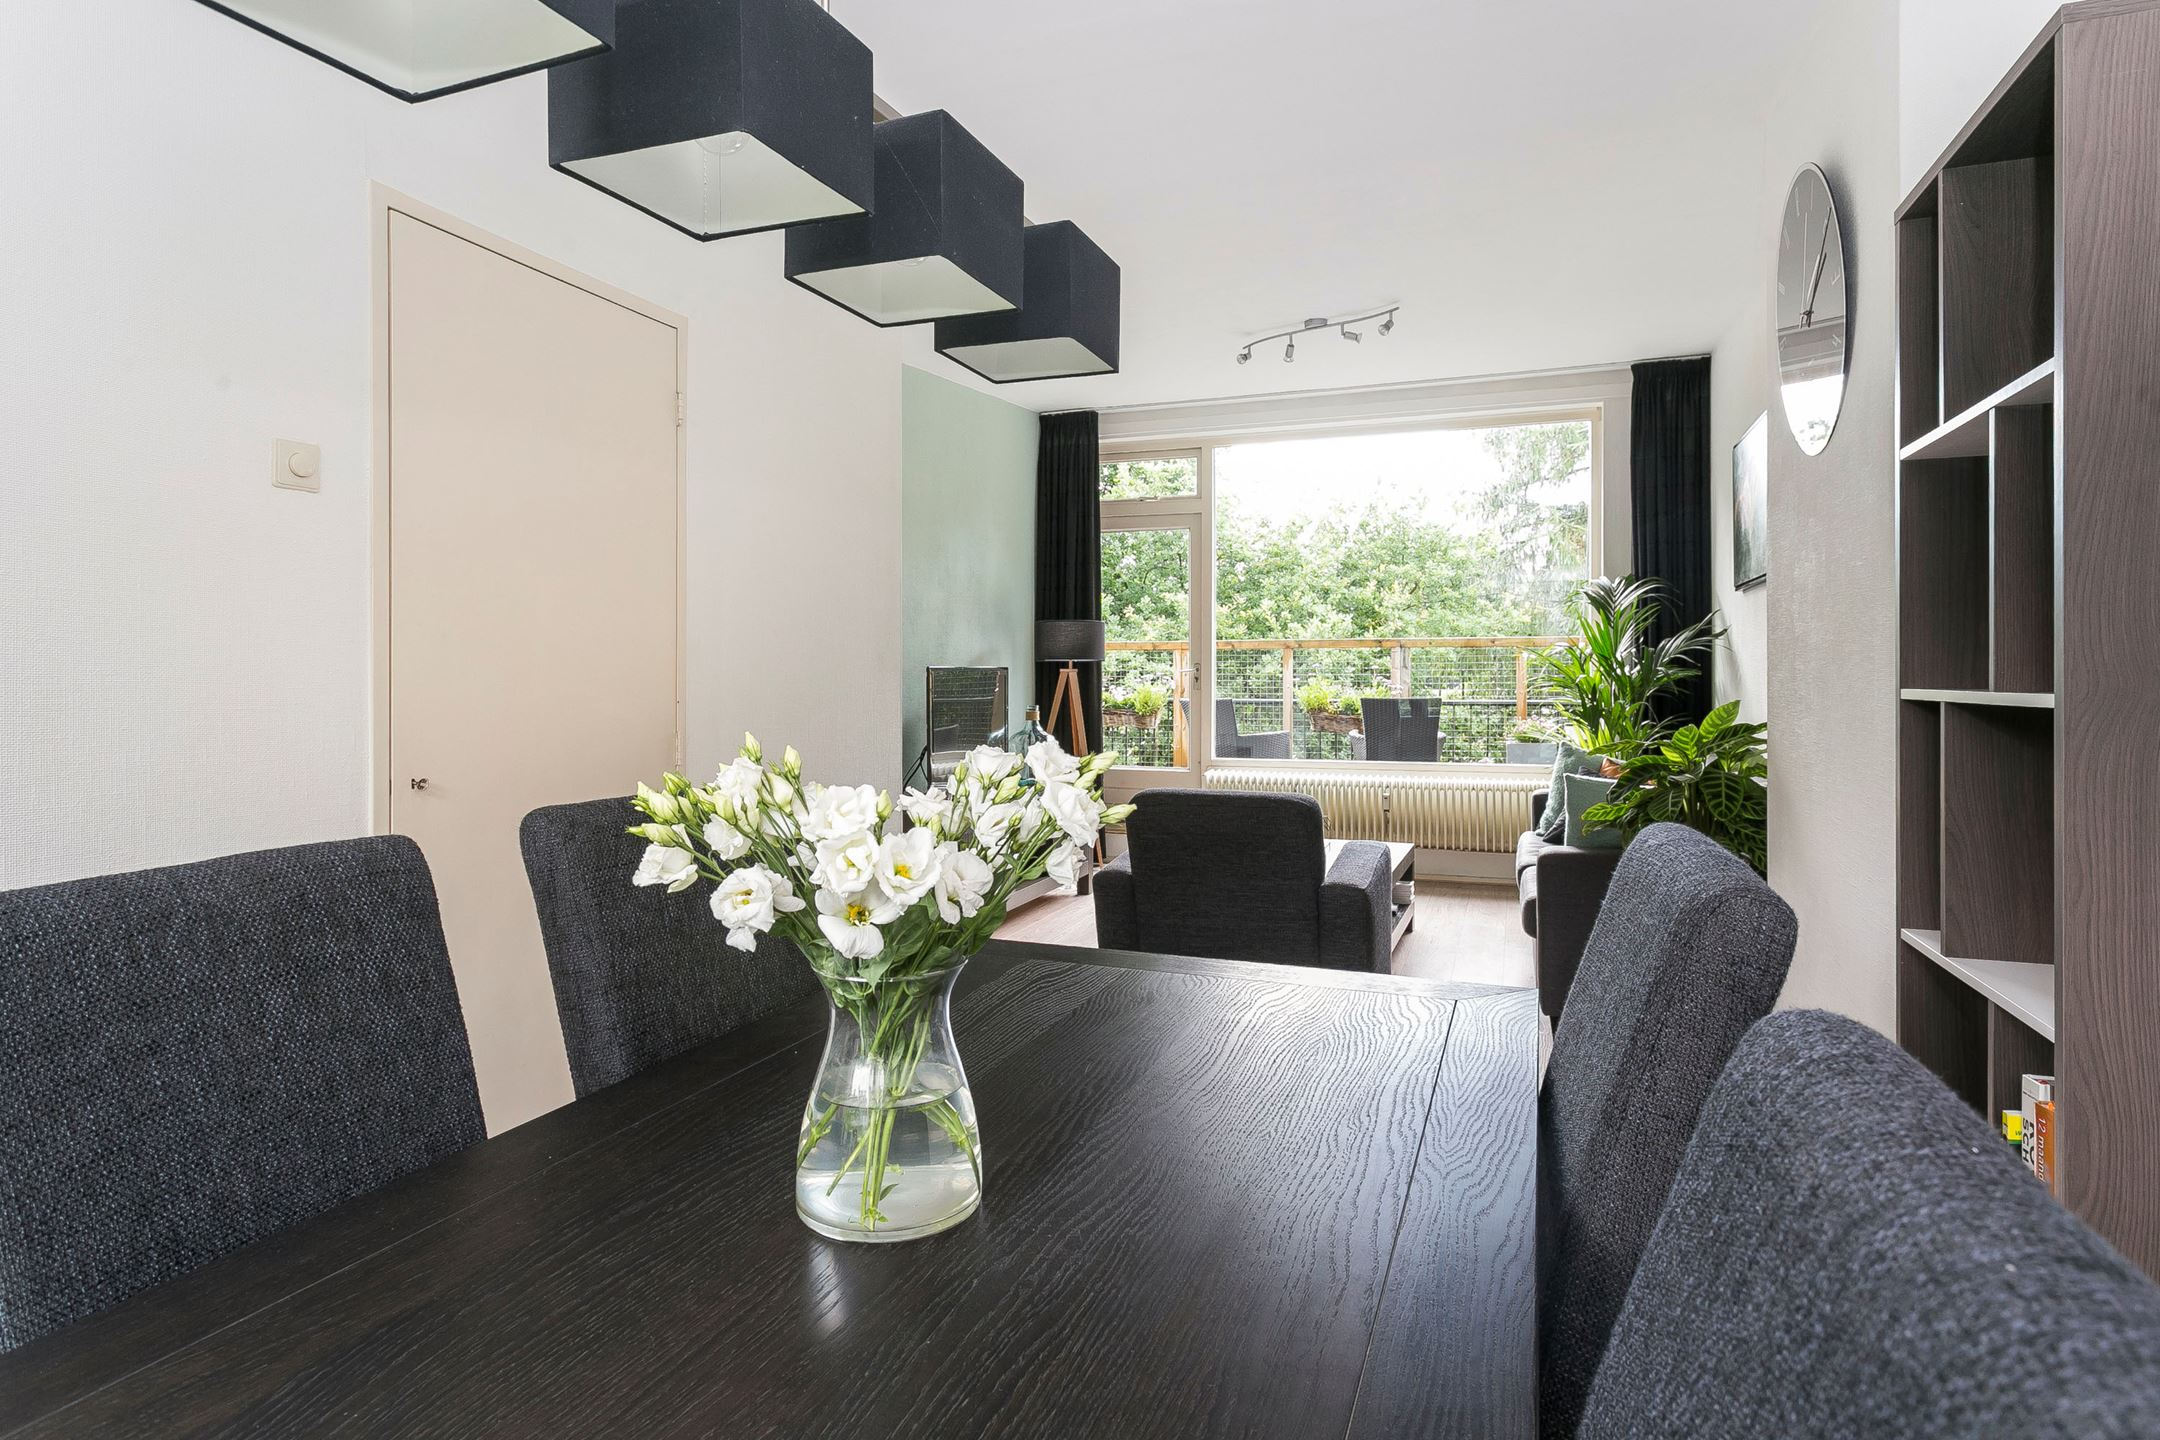 Appartement te koop: debussystraat 3  4 6815 hk arnhem [funda]